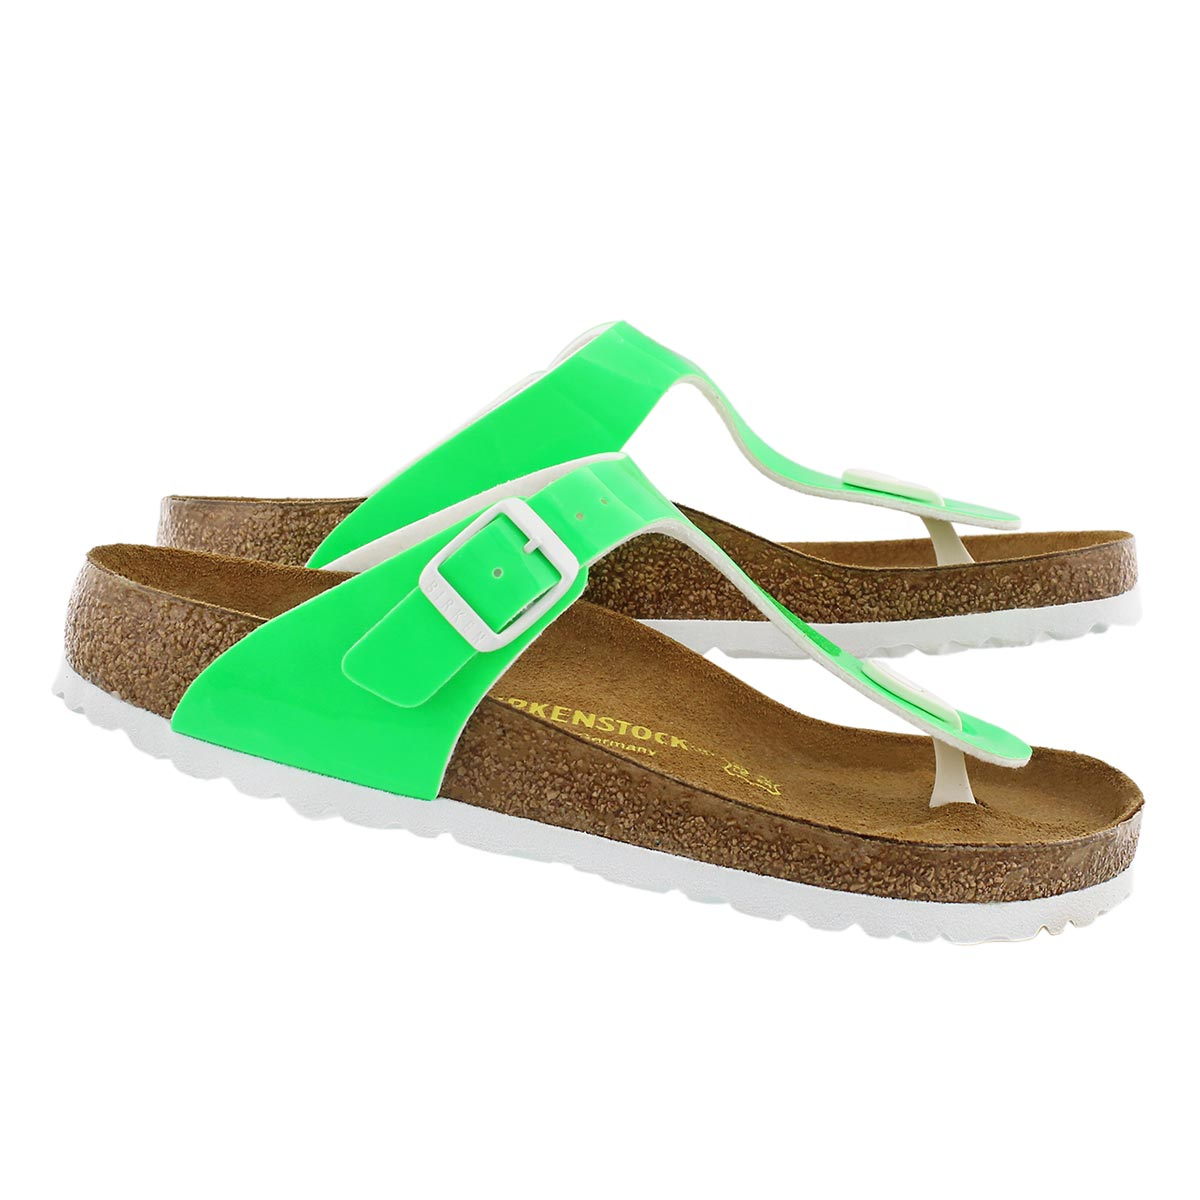 Lds Gizeh neon green thong sandal